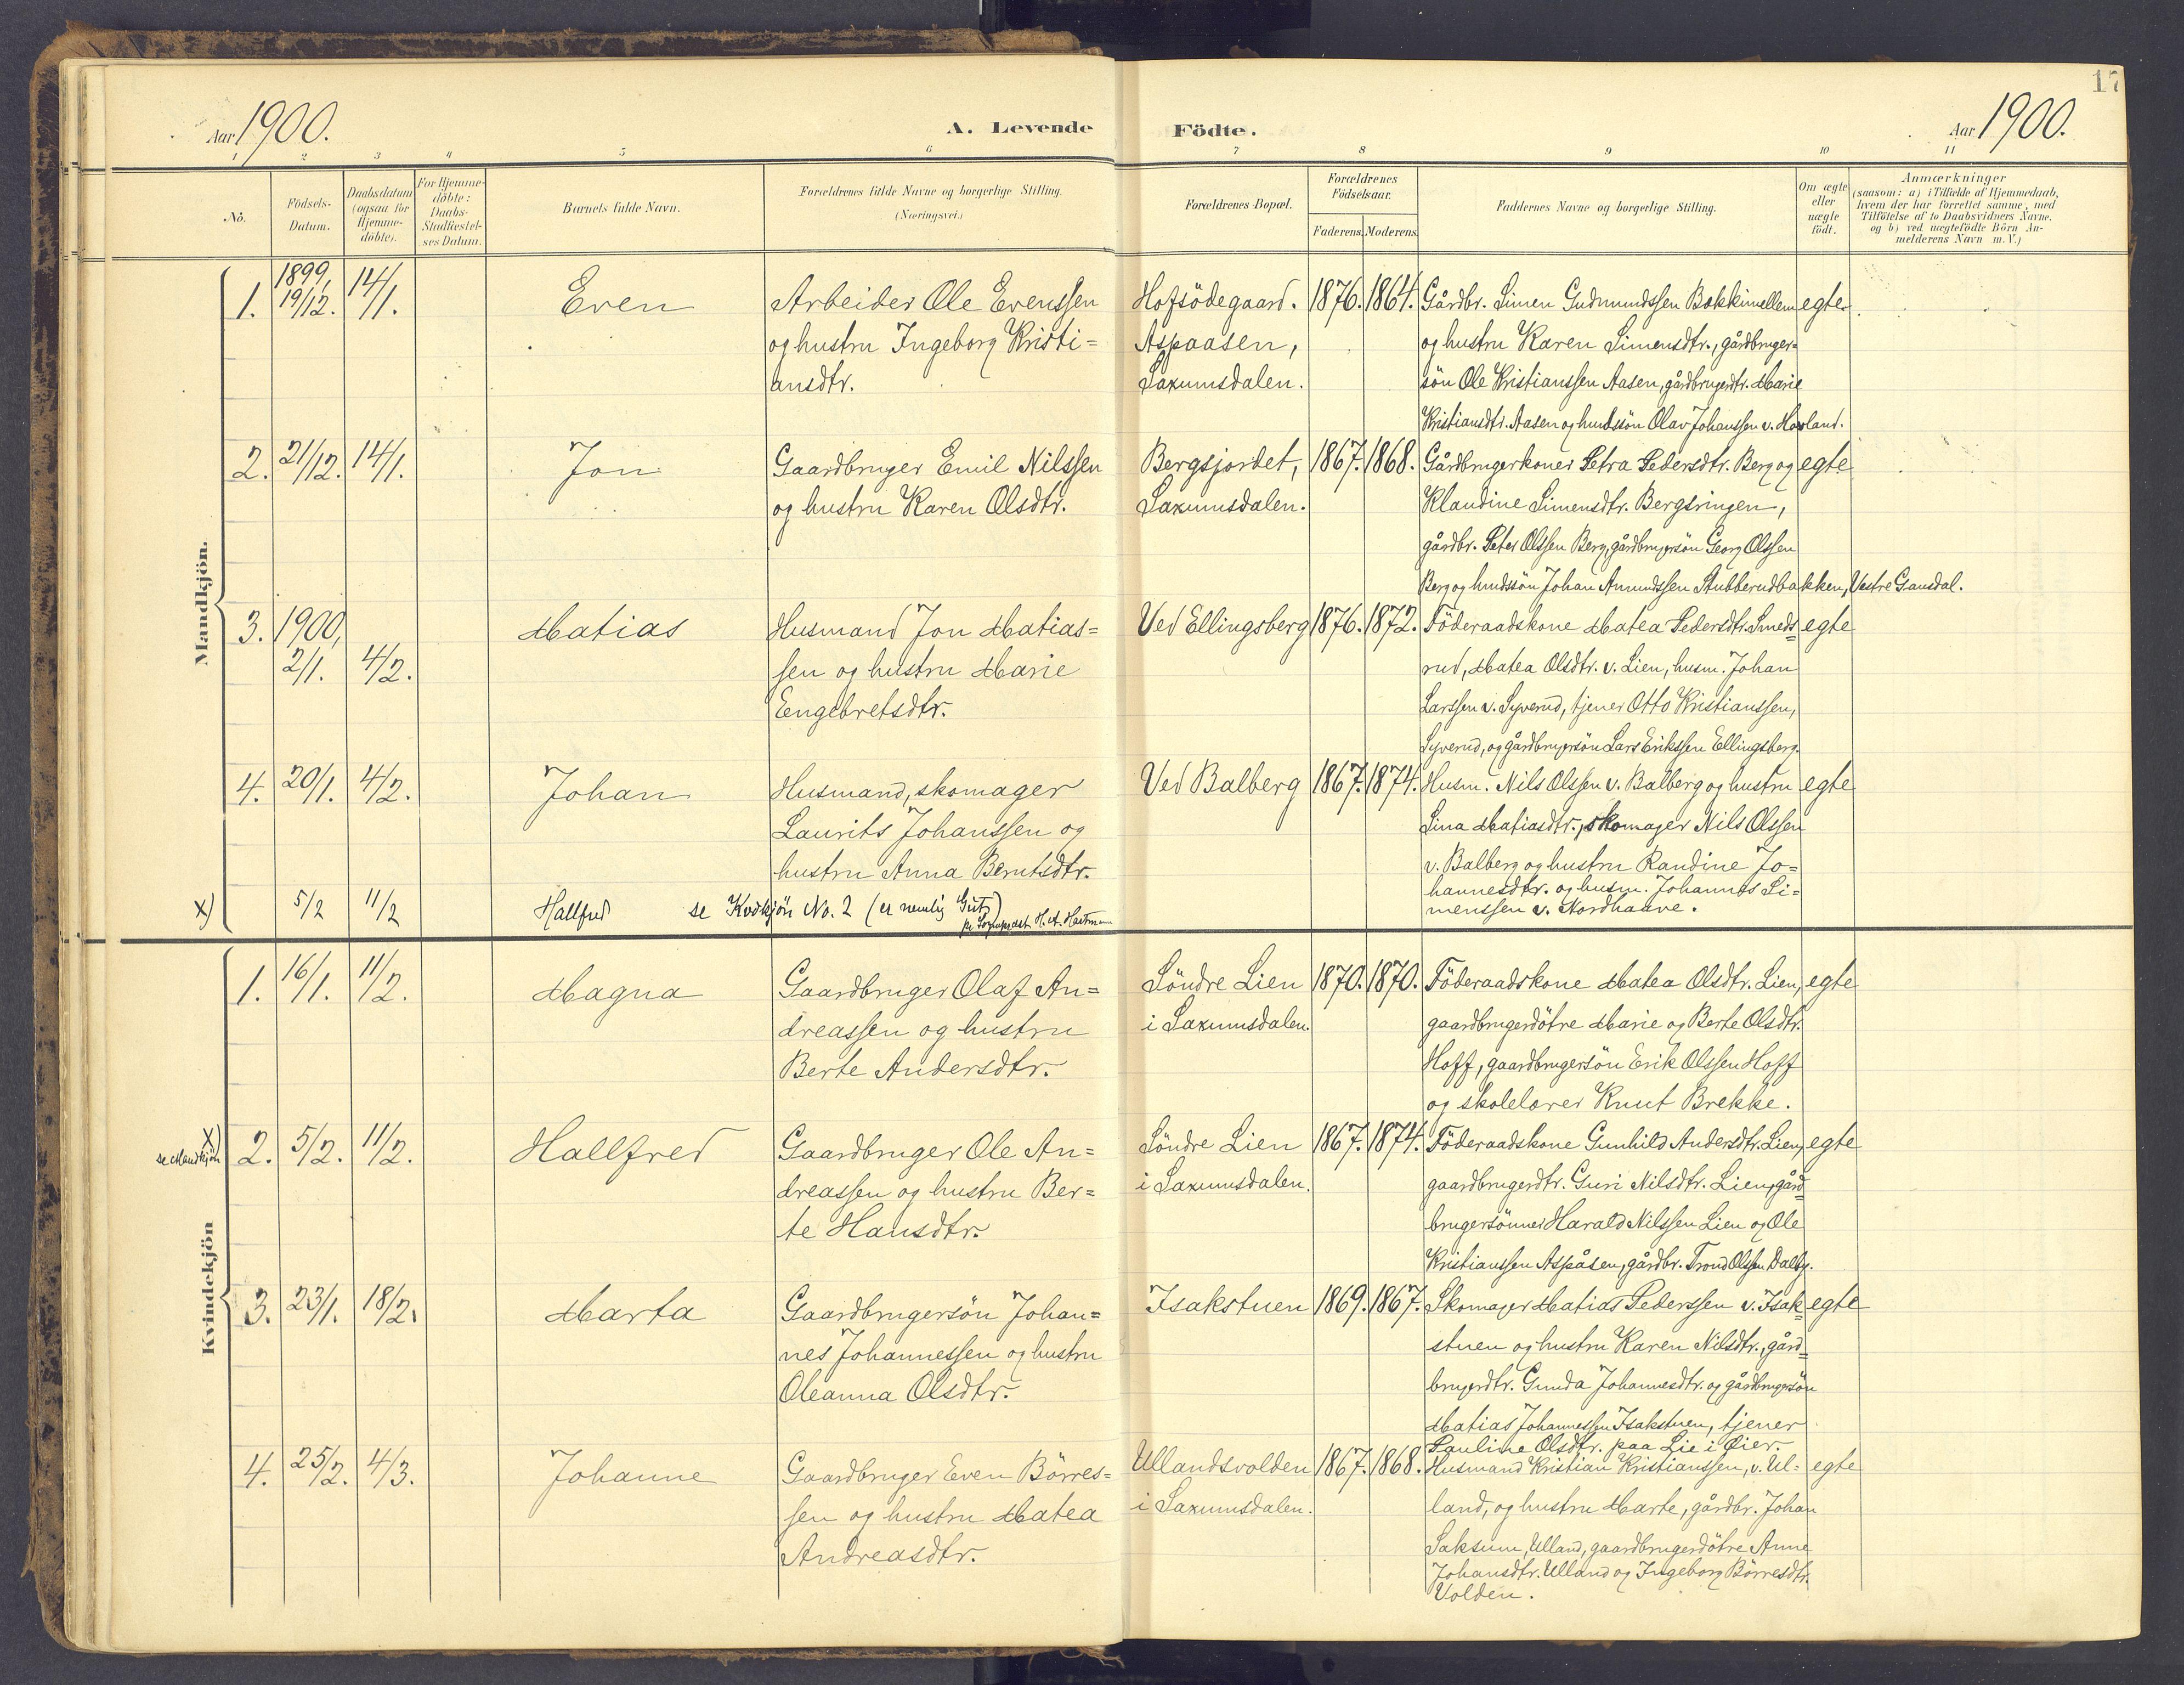 SAH, Fåberg prestekontor, Ministerialbok nr. 12, 1899-1915, s. 17